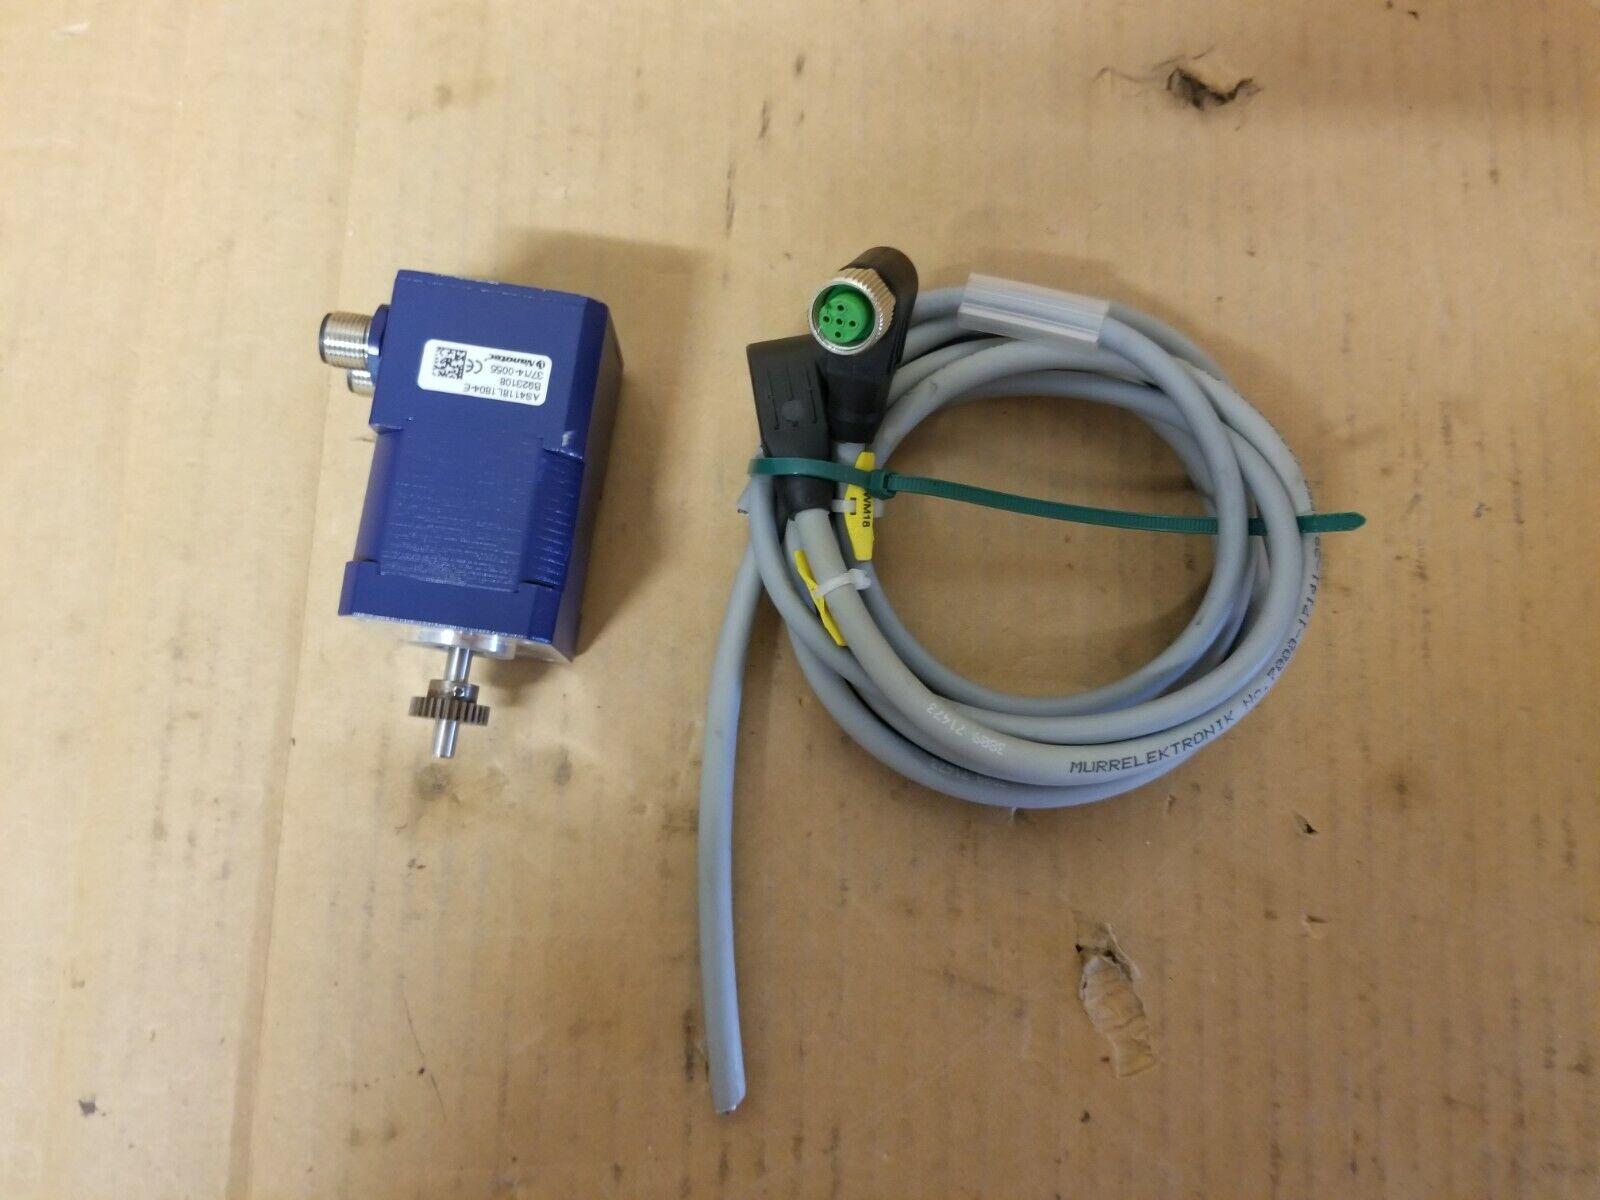 Nanotec ST4209L1206 1.2A 4.0V Stepper Motor